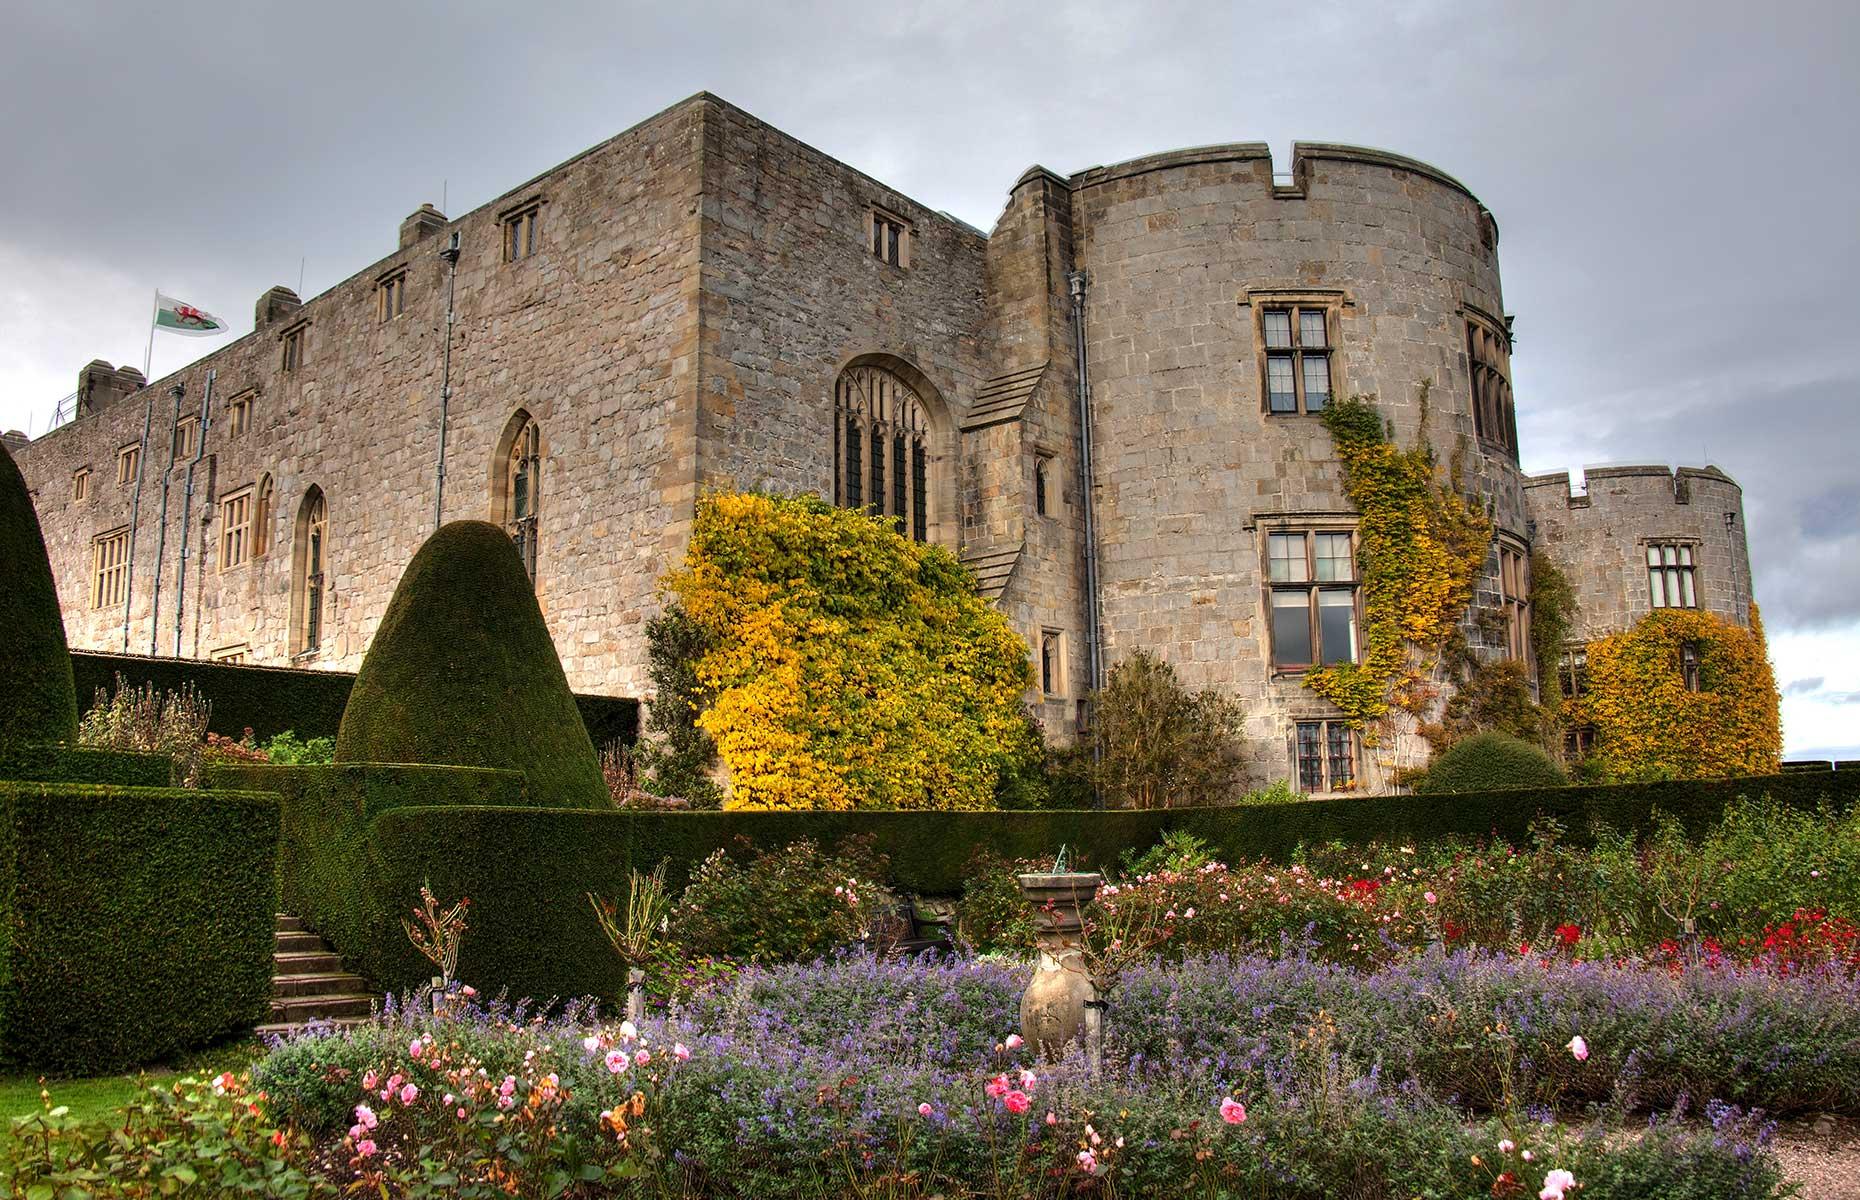 Chirk Castle (Image: Gail Johnson/Shutterstock)